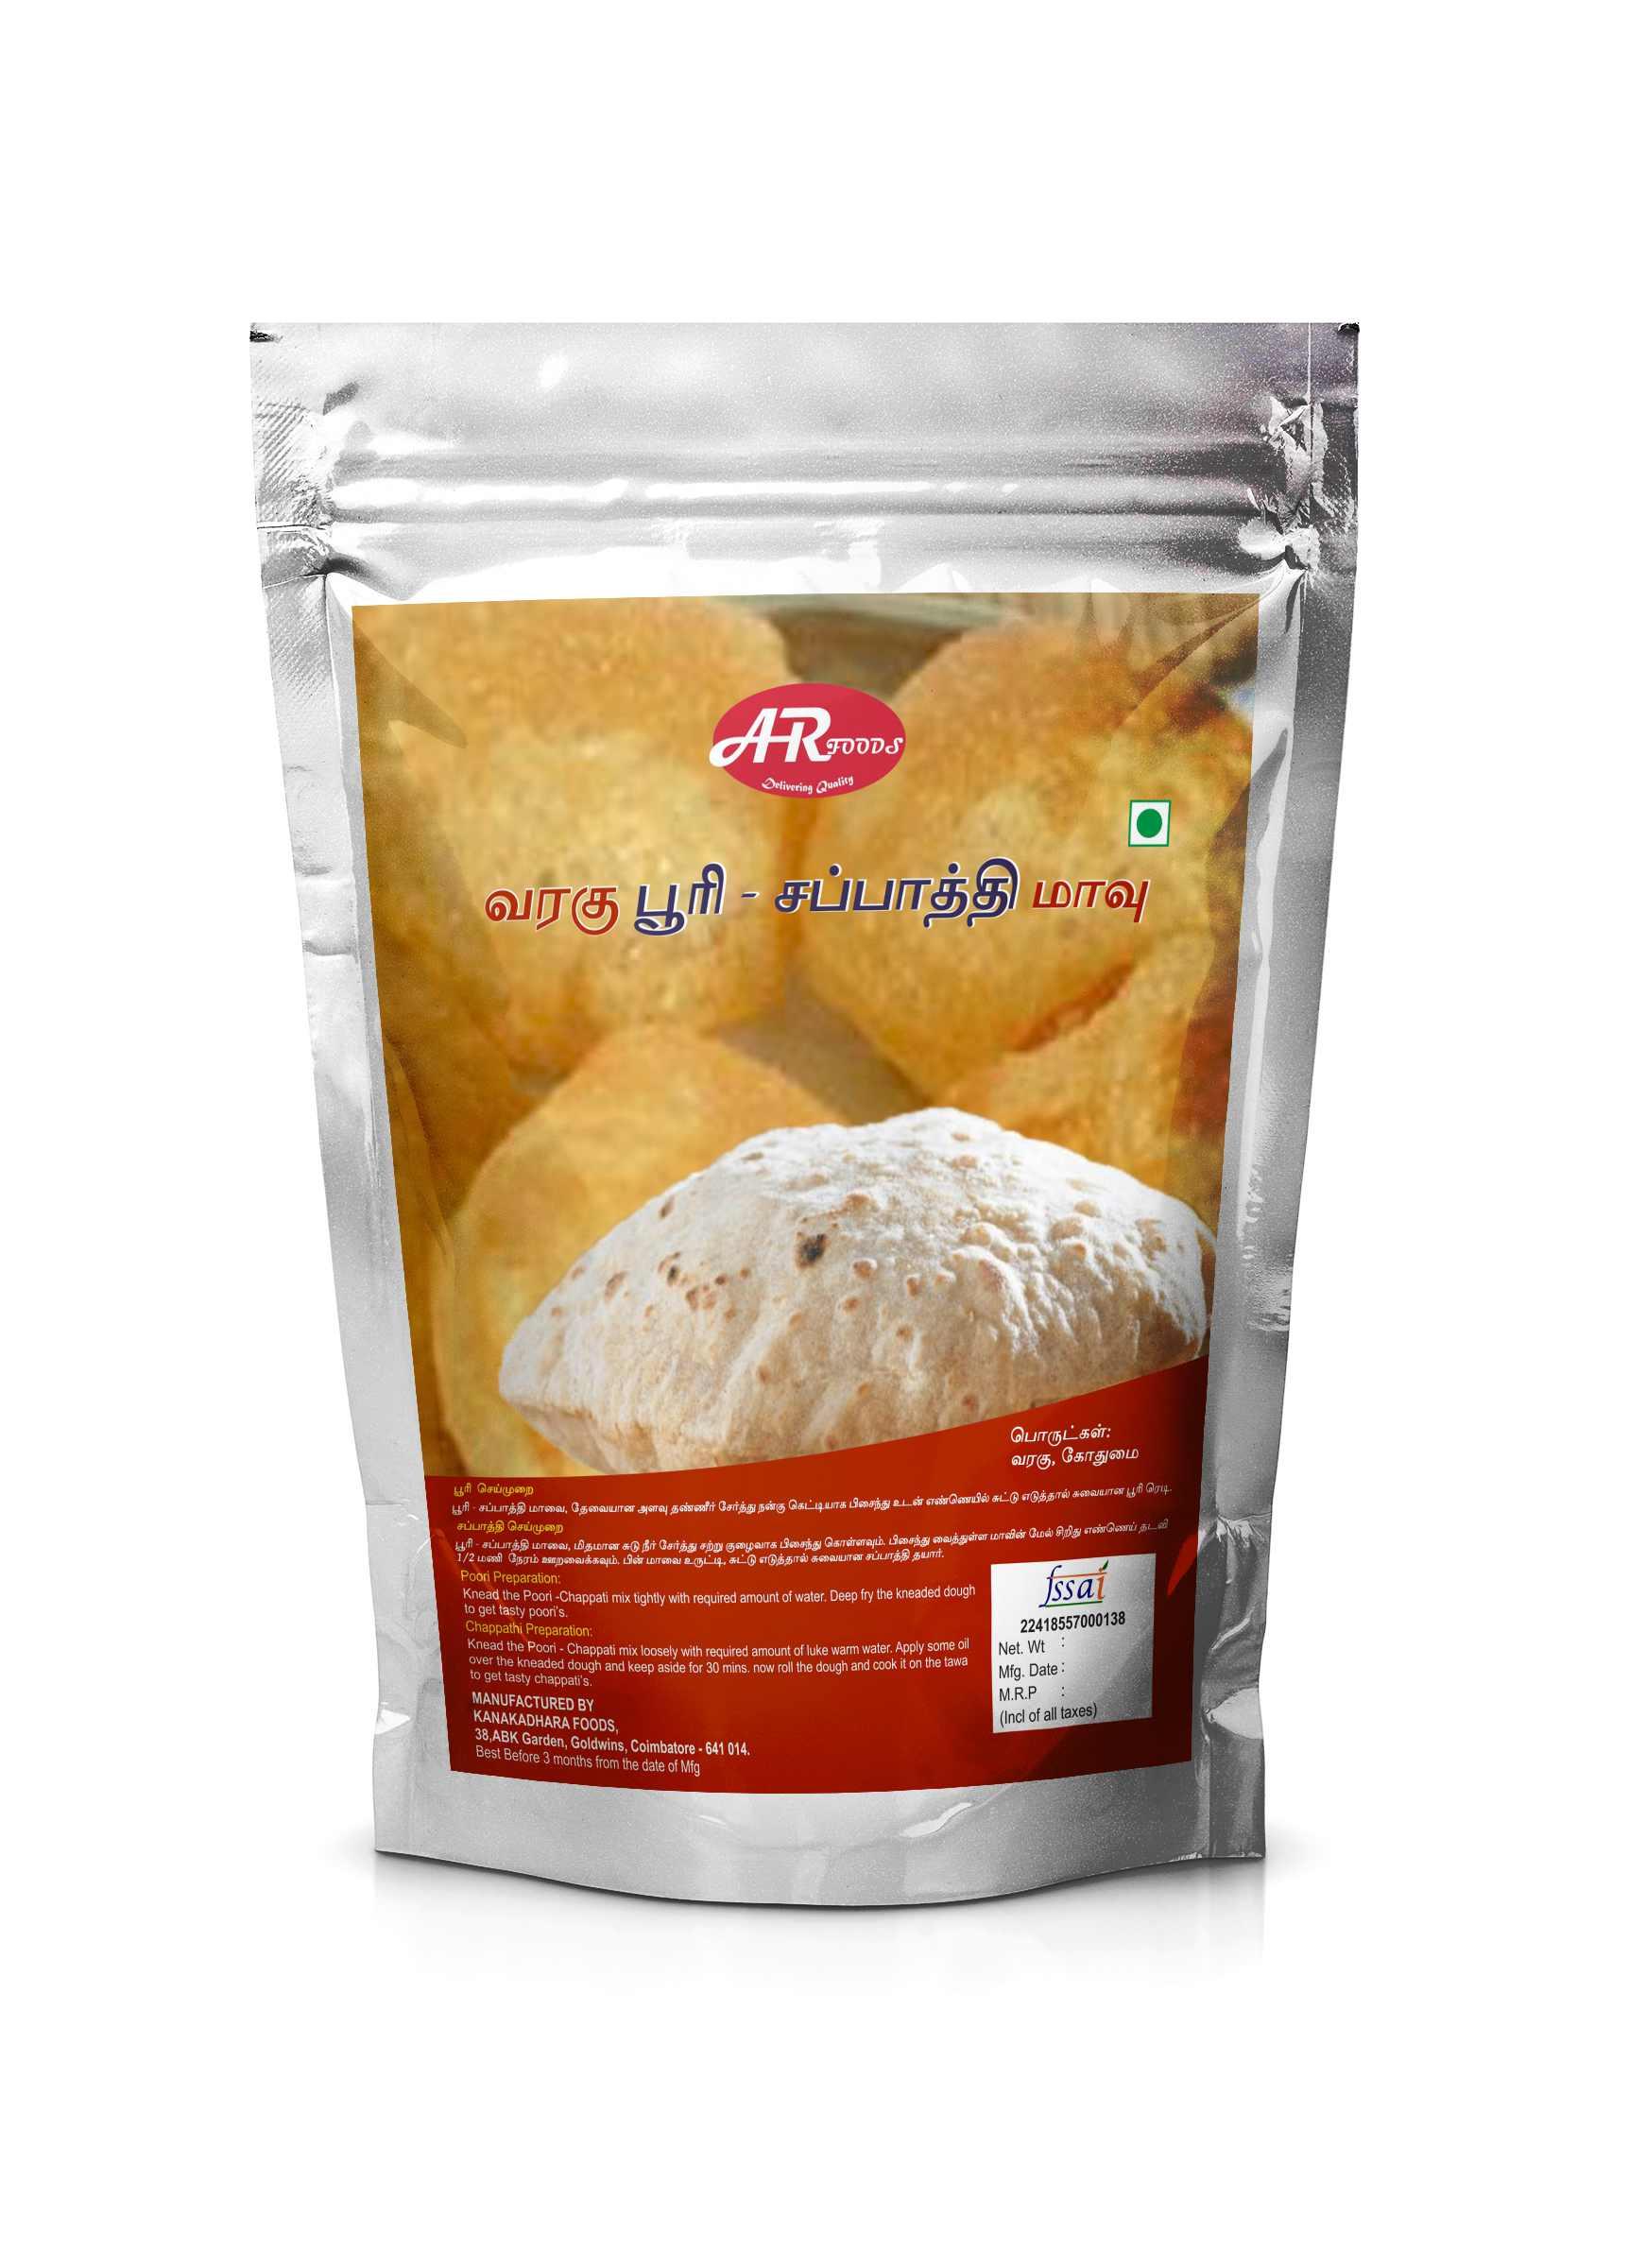 Varagu poori_ar_foods_coimbatore